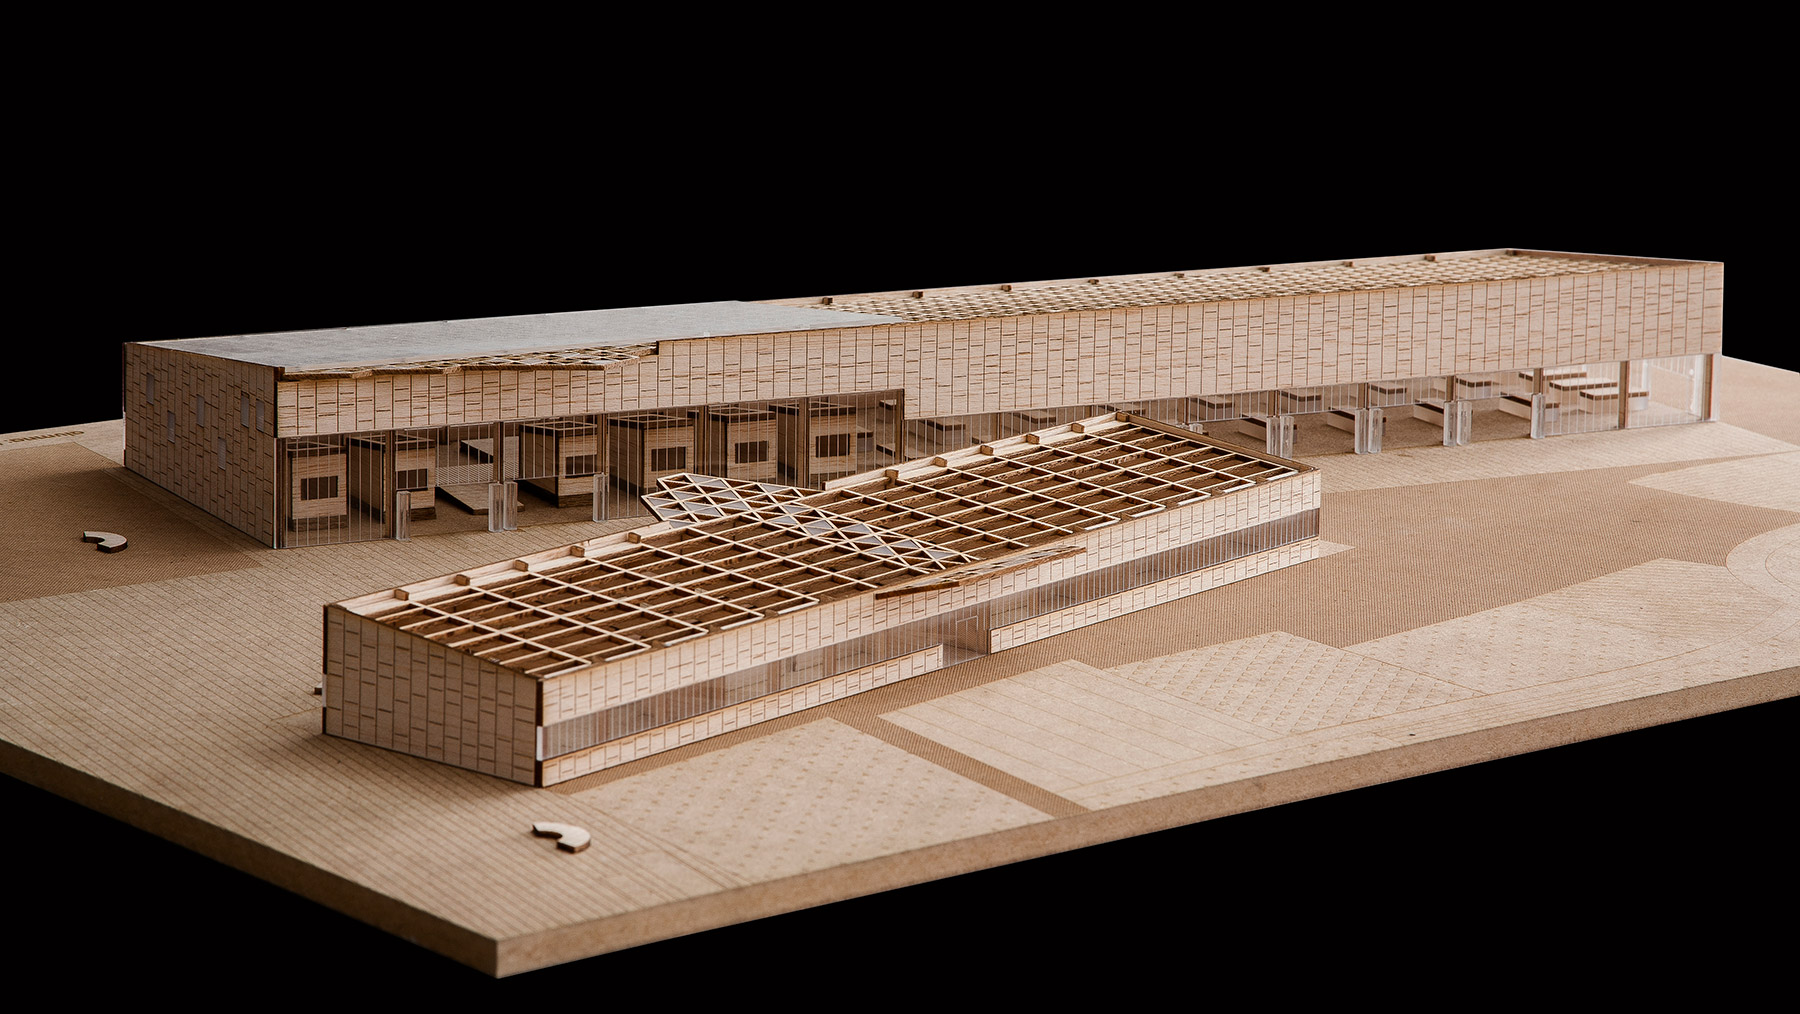 maqueta-arquitectura-architecture-model-valencia-maqueta-pfc-ETSAV-centro-artesanos- (5)